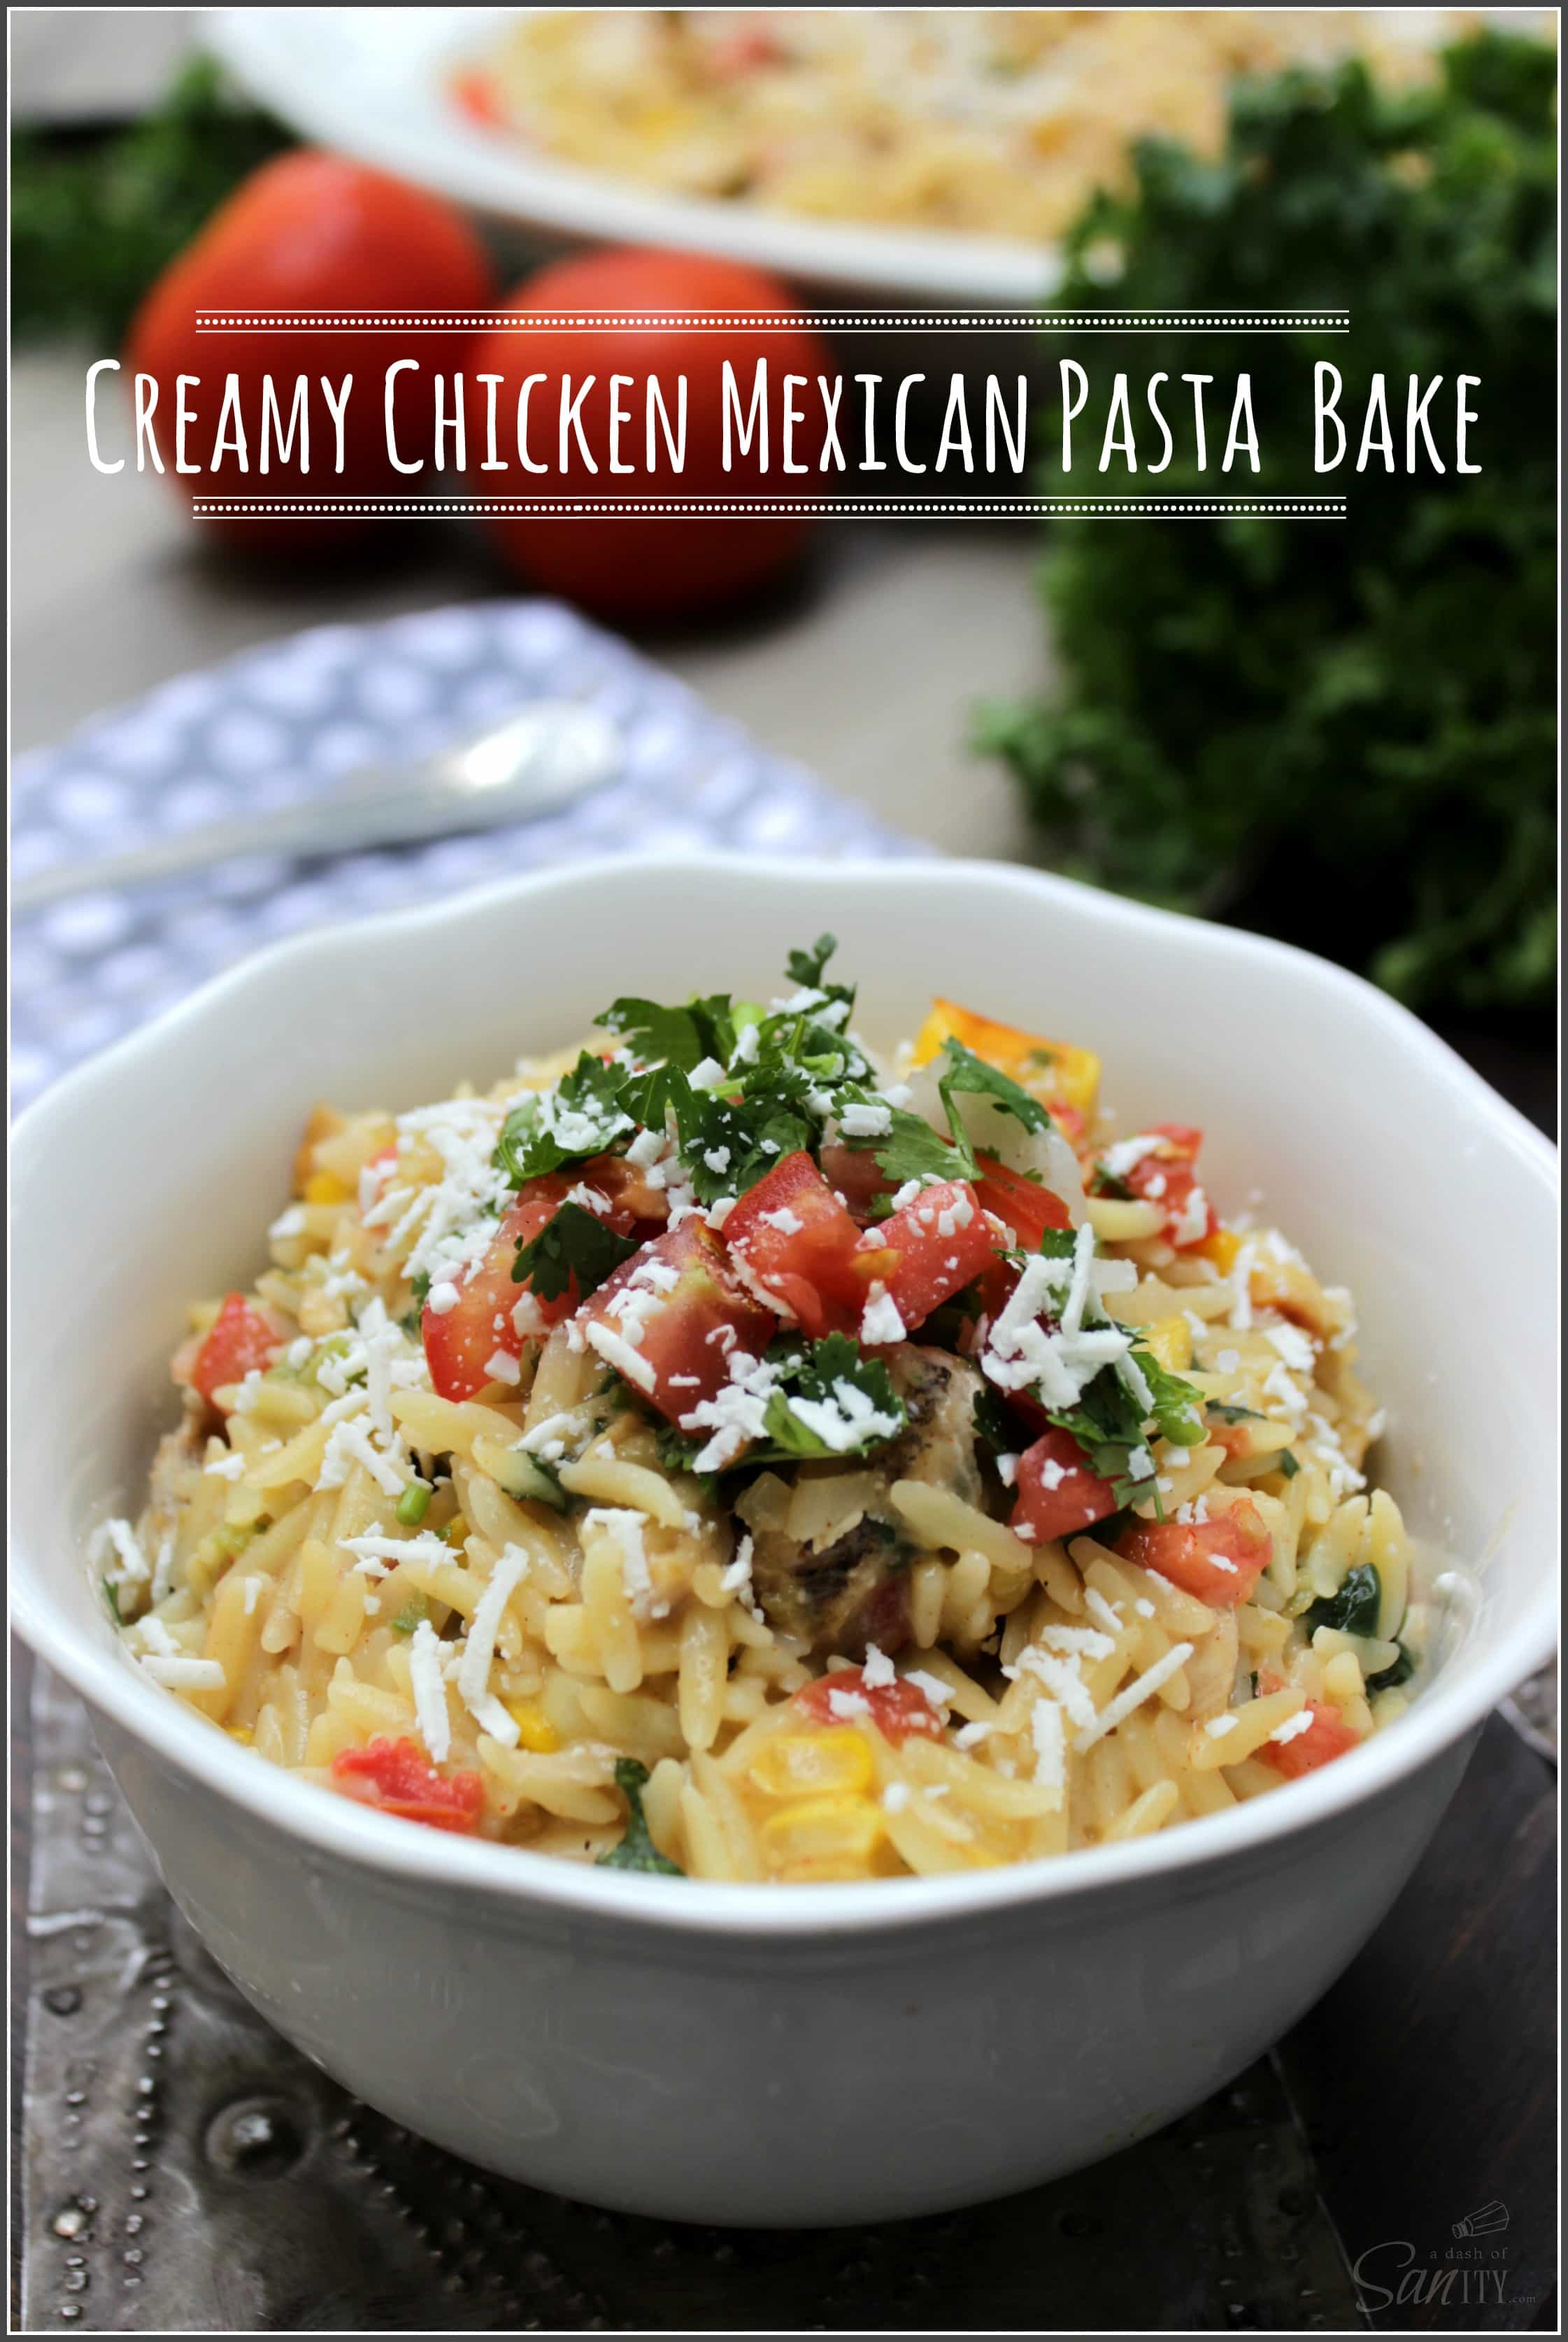 Creamy Chicken Mexican Pasta Bake